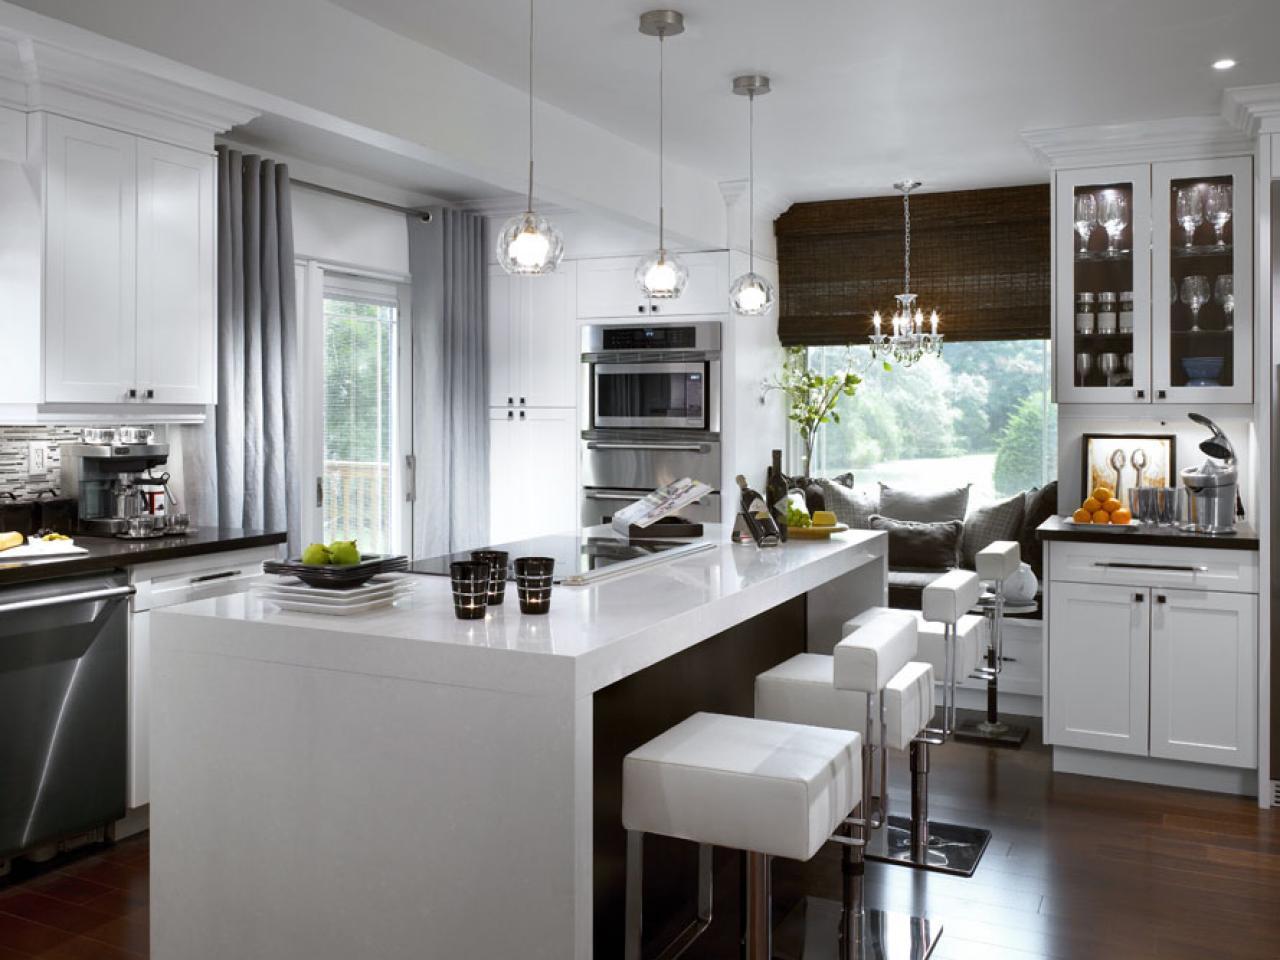 candice olson kitchen countertops photo - 10